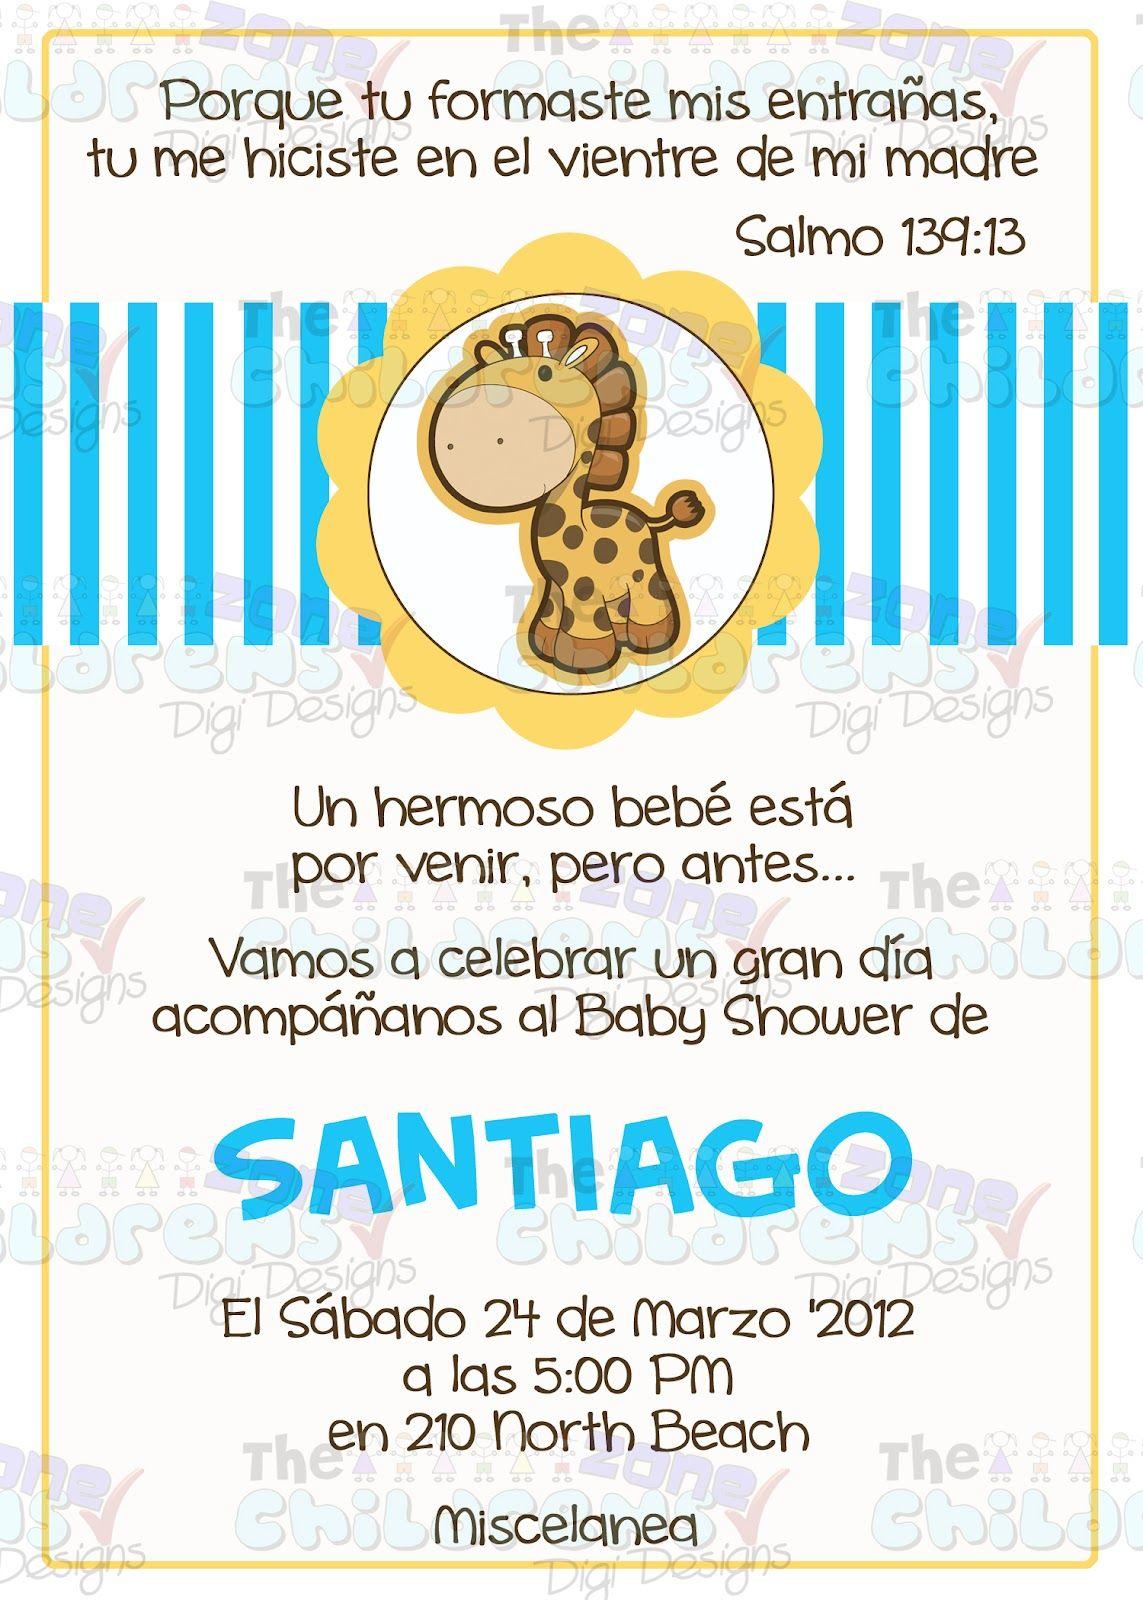 The Childrens Zone Digi Designs Invitaciones Para Baby Shower